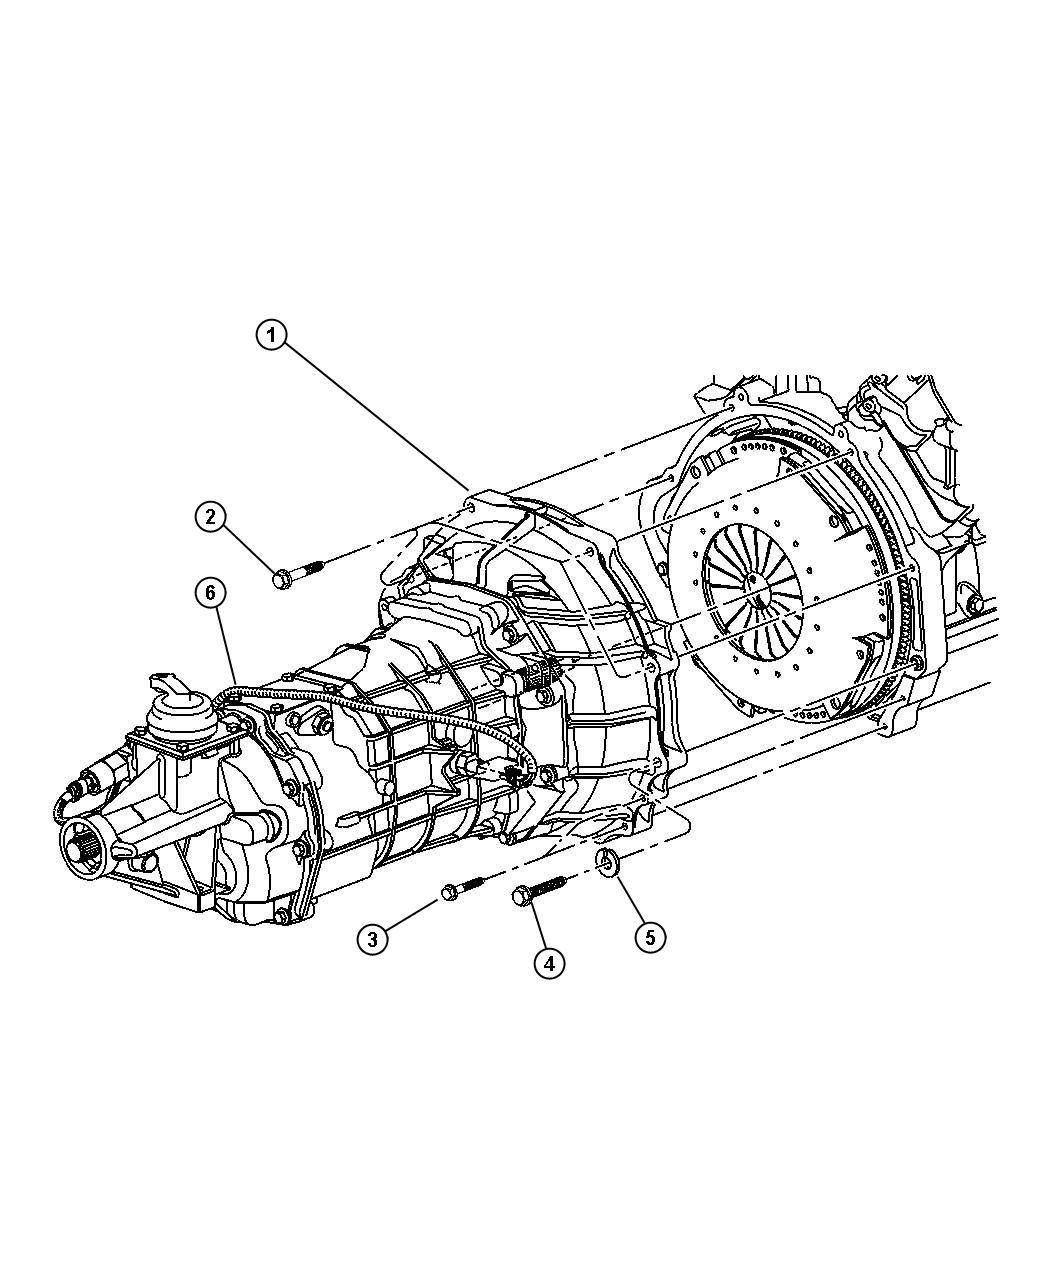 Rebuilt 7mge Engines